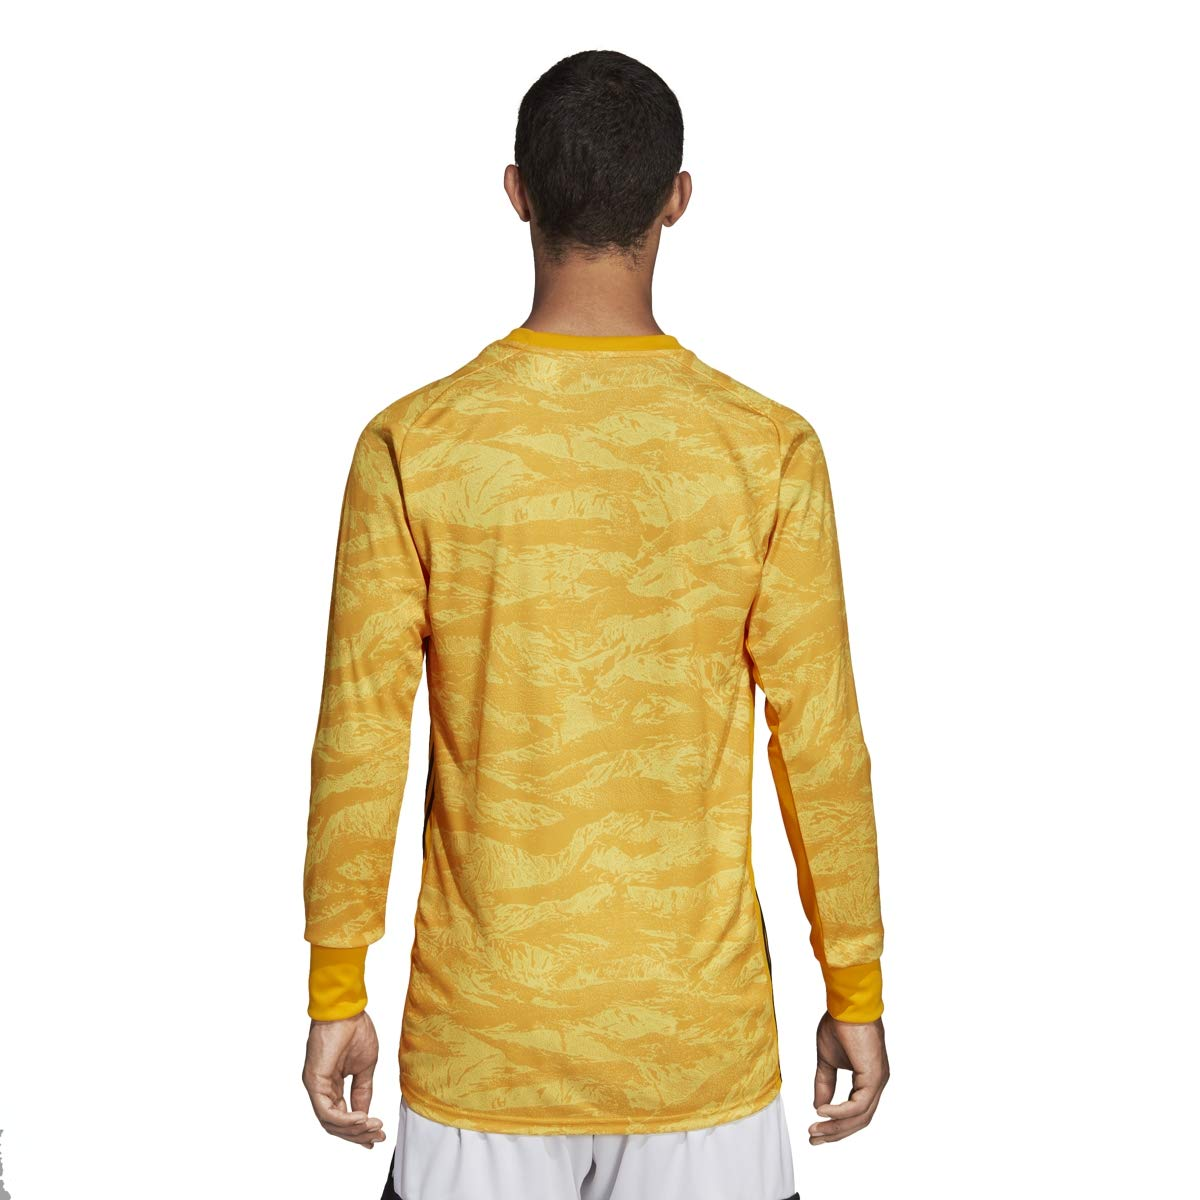 adidas AdiPro 18 Goalkeeper Jersey - Men's Soccer